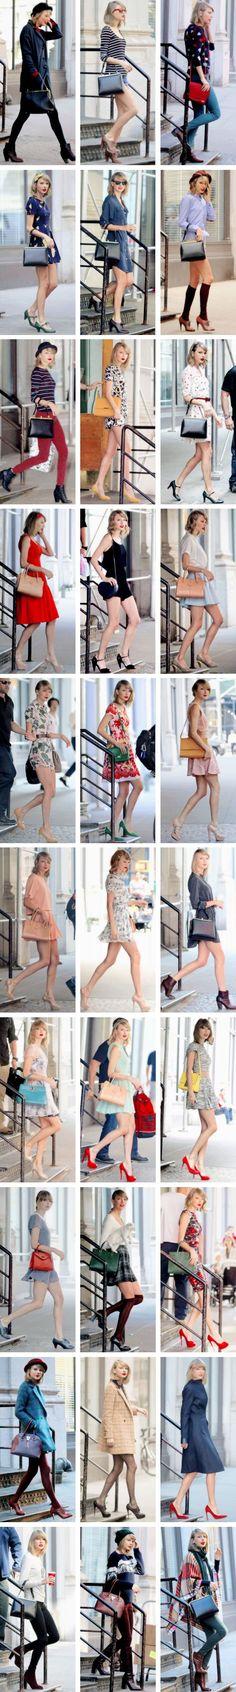 A Taylor Swift fashion collage ♥♥♥♥♥ she looks perfect anywhere Taylor Swift Moda, Estilo Taylor Swift, Taylor Swift Outfits, Taylor Swift Style, Taylor Alison Swift, Look Fashion, Trendy Fashion, Dress Fashion, Fashion Clothes